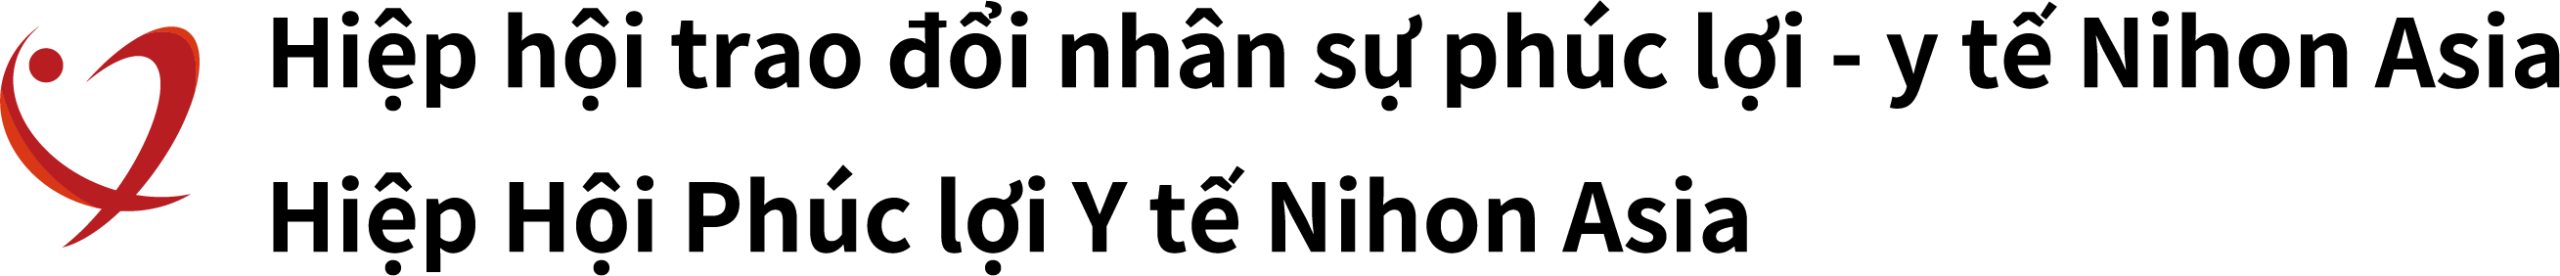 Hiệp Hội Phúc lợi Y tế Nihon Asia